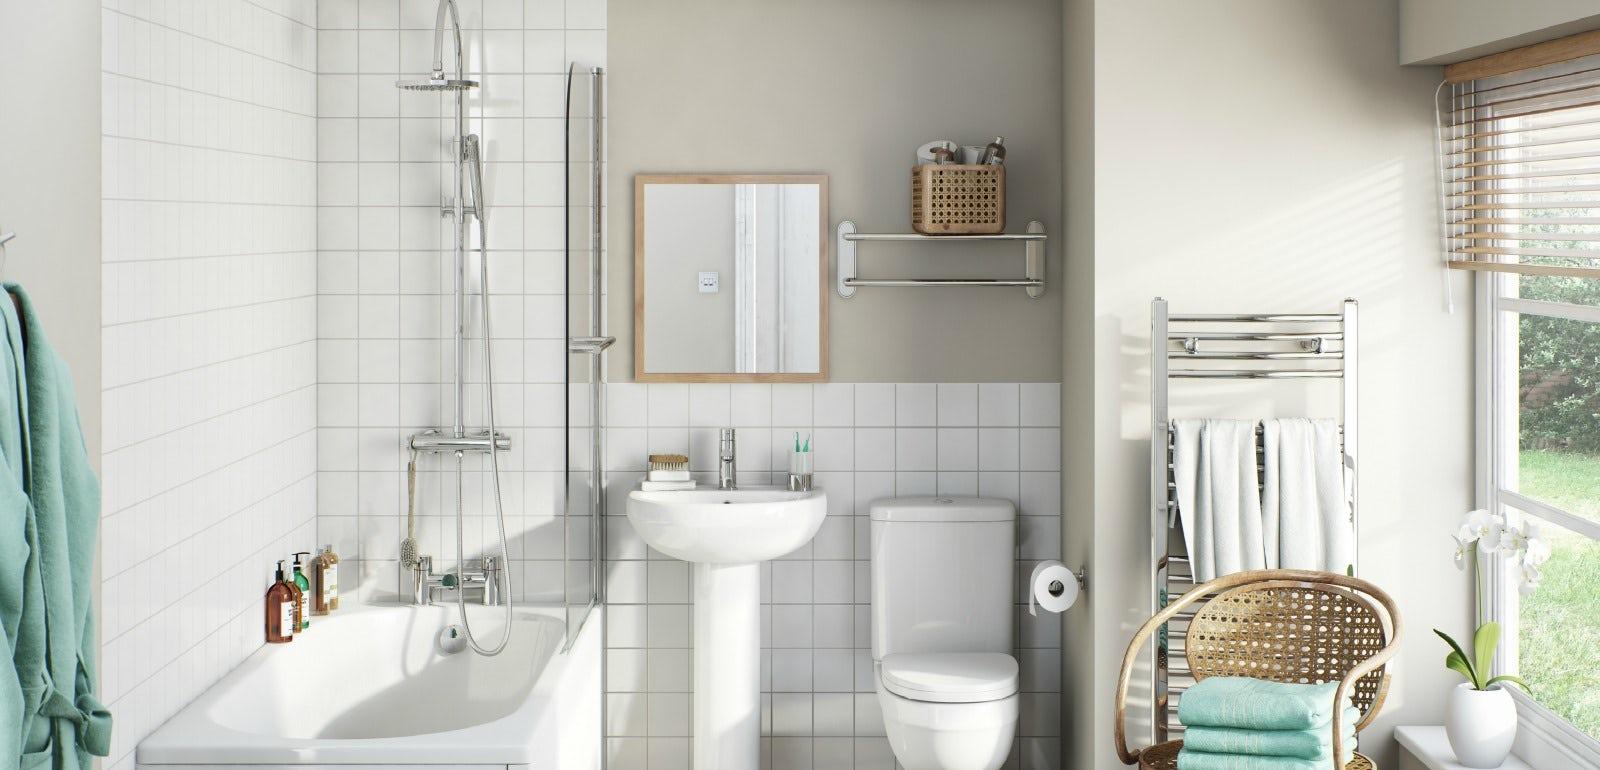 Modern Bathroom Designs Yield Big Returns In Comfort And: Bathroom Suite Buying Guide